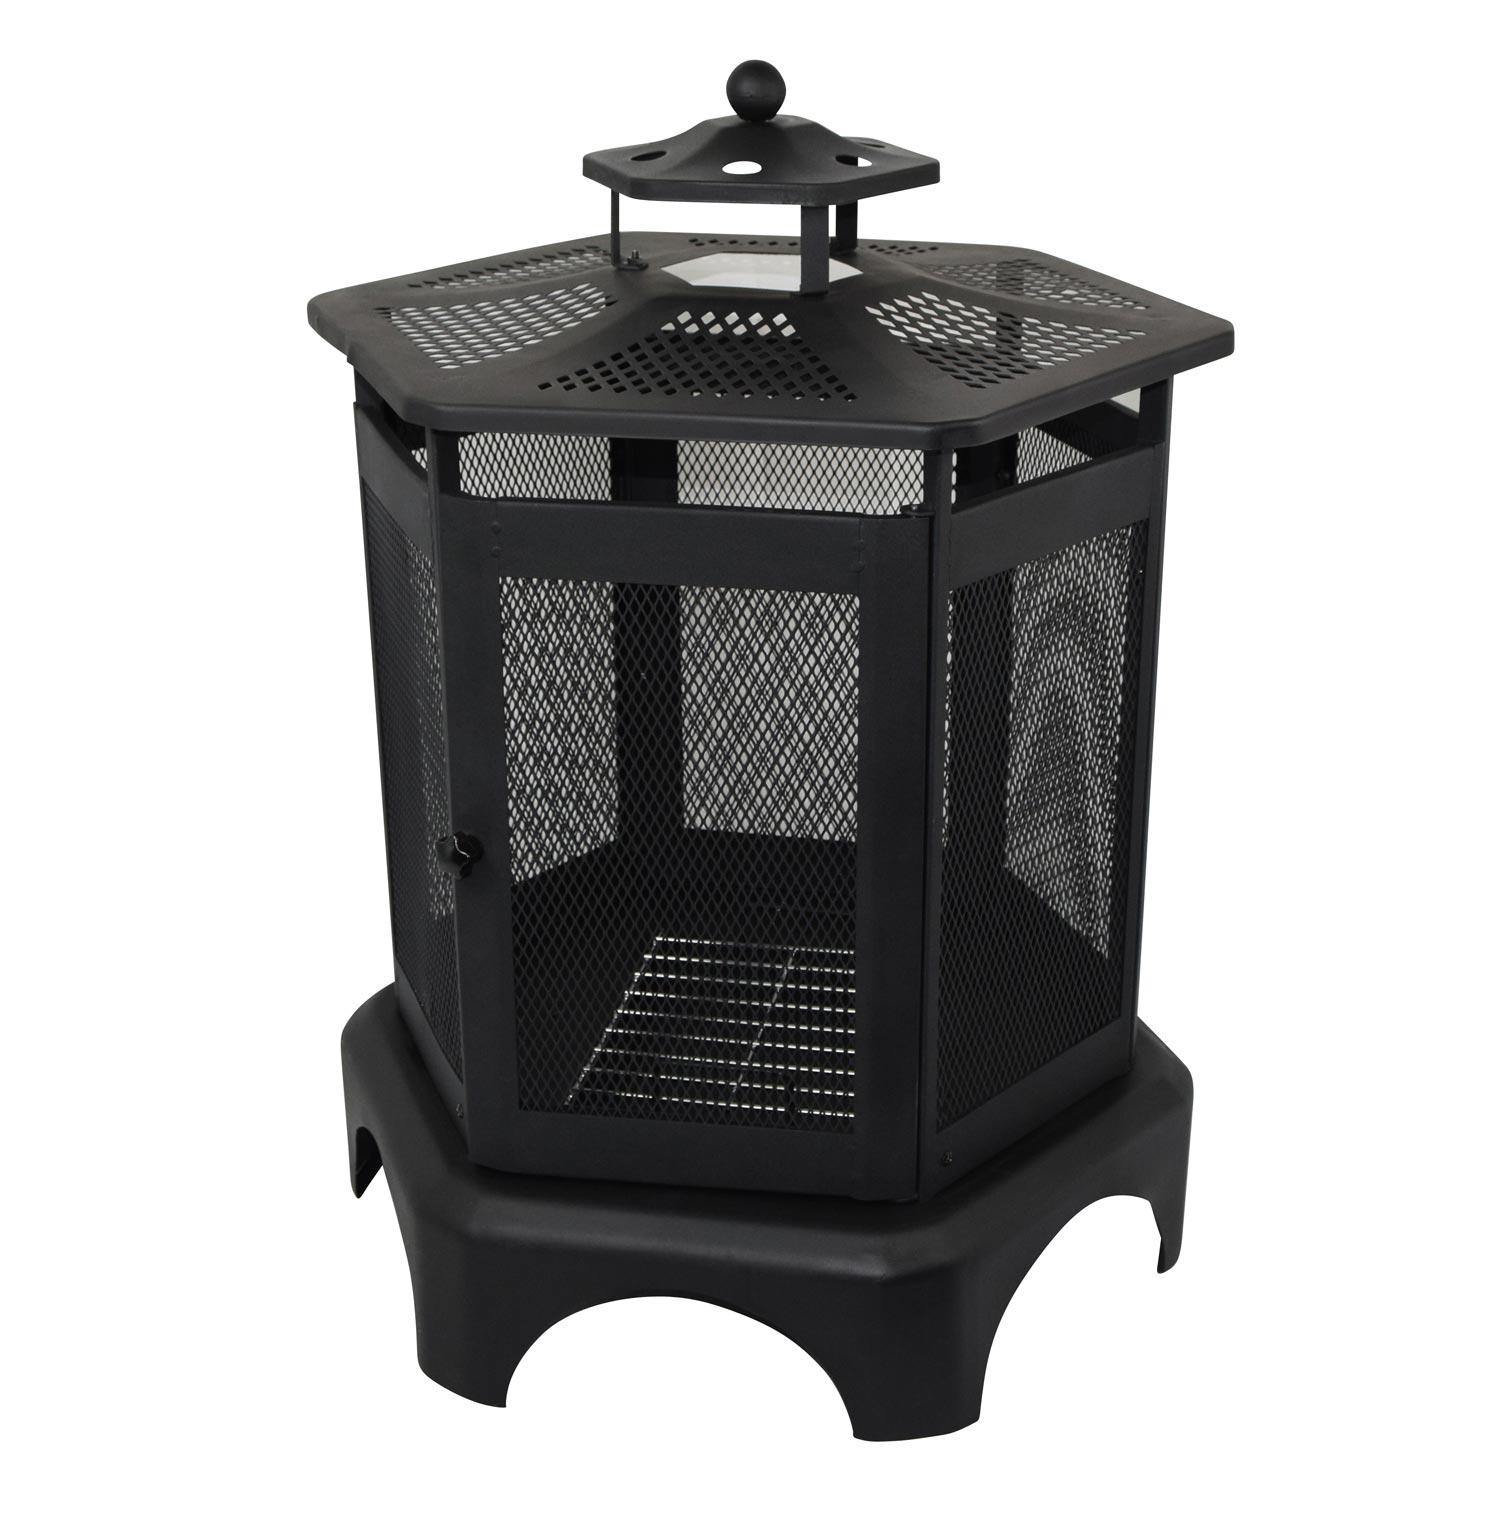 terrassenofen meran schwarz kaufen cafiro. Black Bedroom Furniture Sets. Home Design Ideas